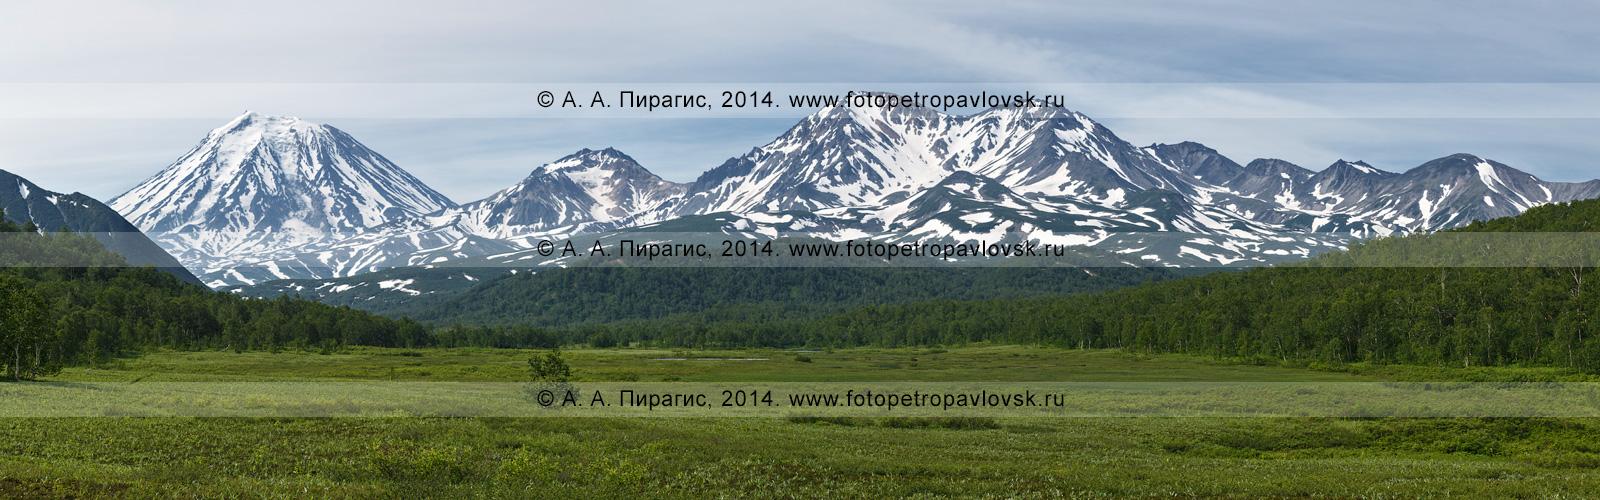 Панорама: вулкан Корякский (Корякская сопка, Koryaksky Volcano), вулкан Арик (гора Арик, Arik Volcano) и вулкан Ааг (гора Ааг, Aag Volcano). Камчатка, Авачинско-Корякская группа вулканов